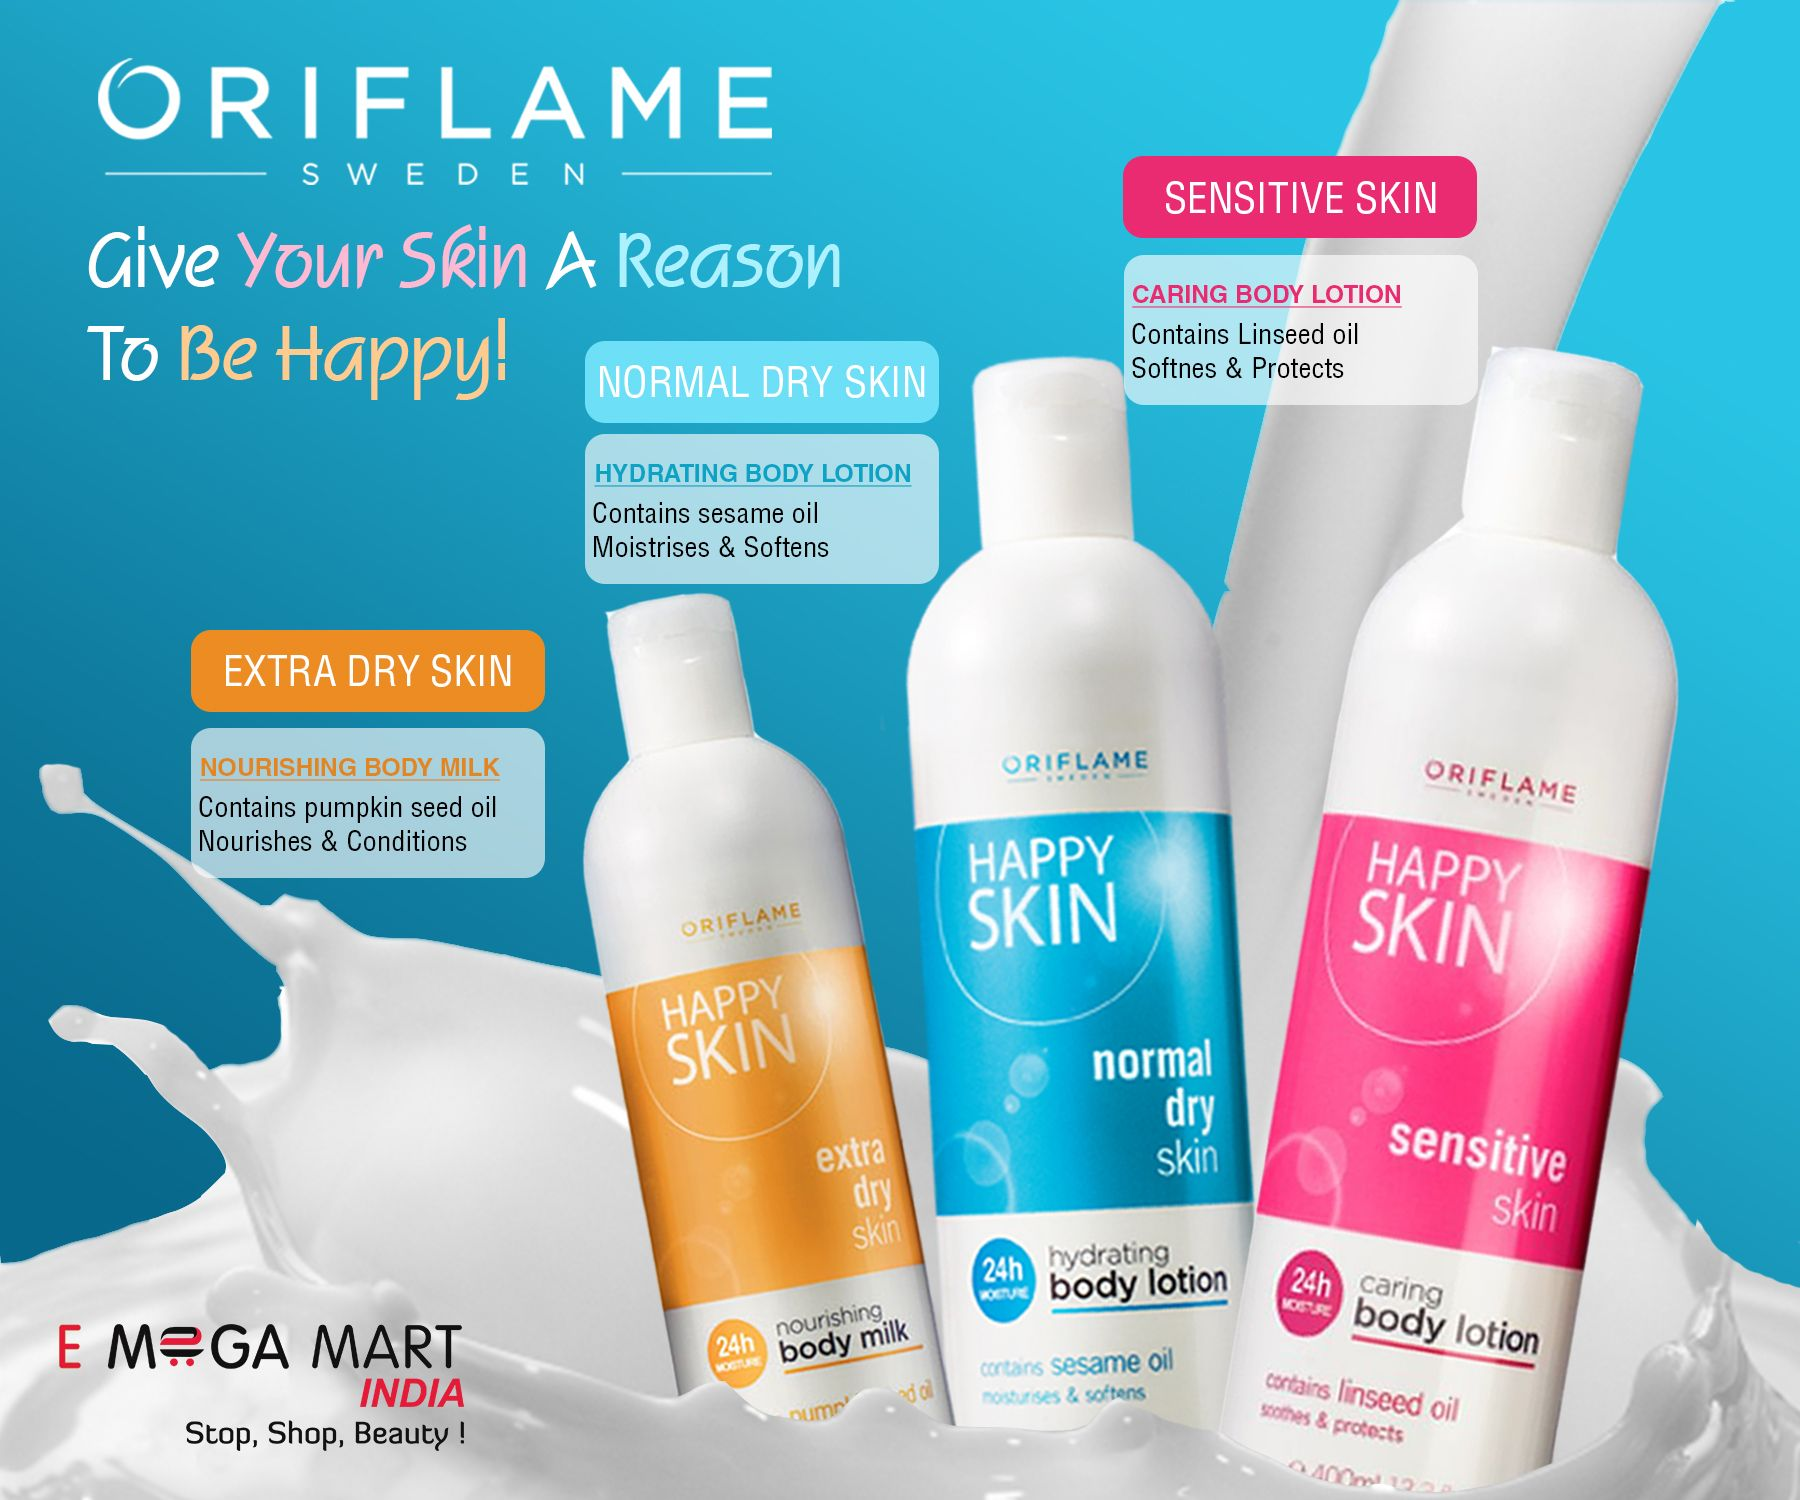 Oriflame Sweden Happy Skin The Perfect Range Of Moisturizing